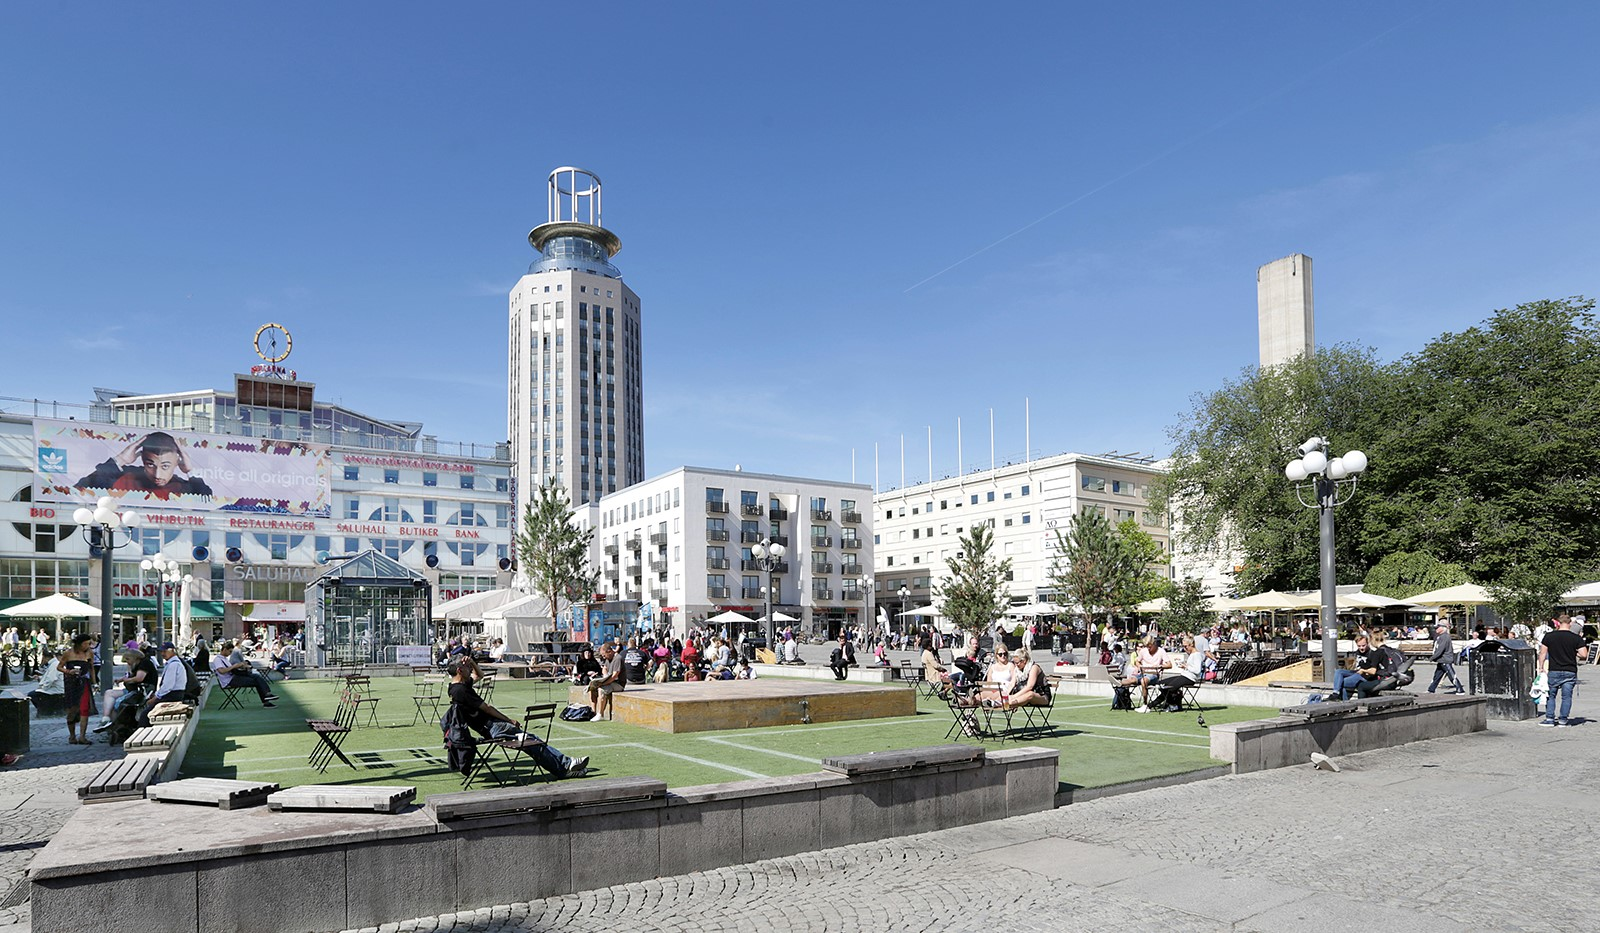 Siargatan 9, 3 tr - Medborgarplatsen